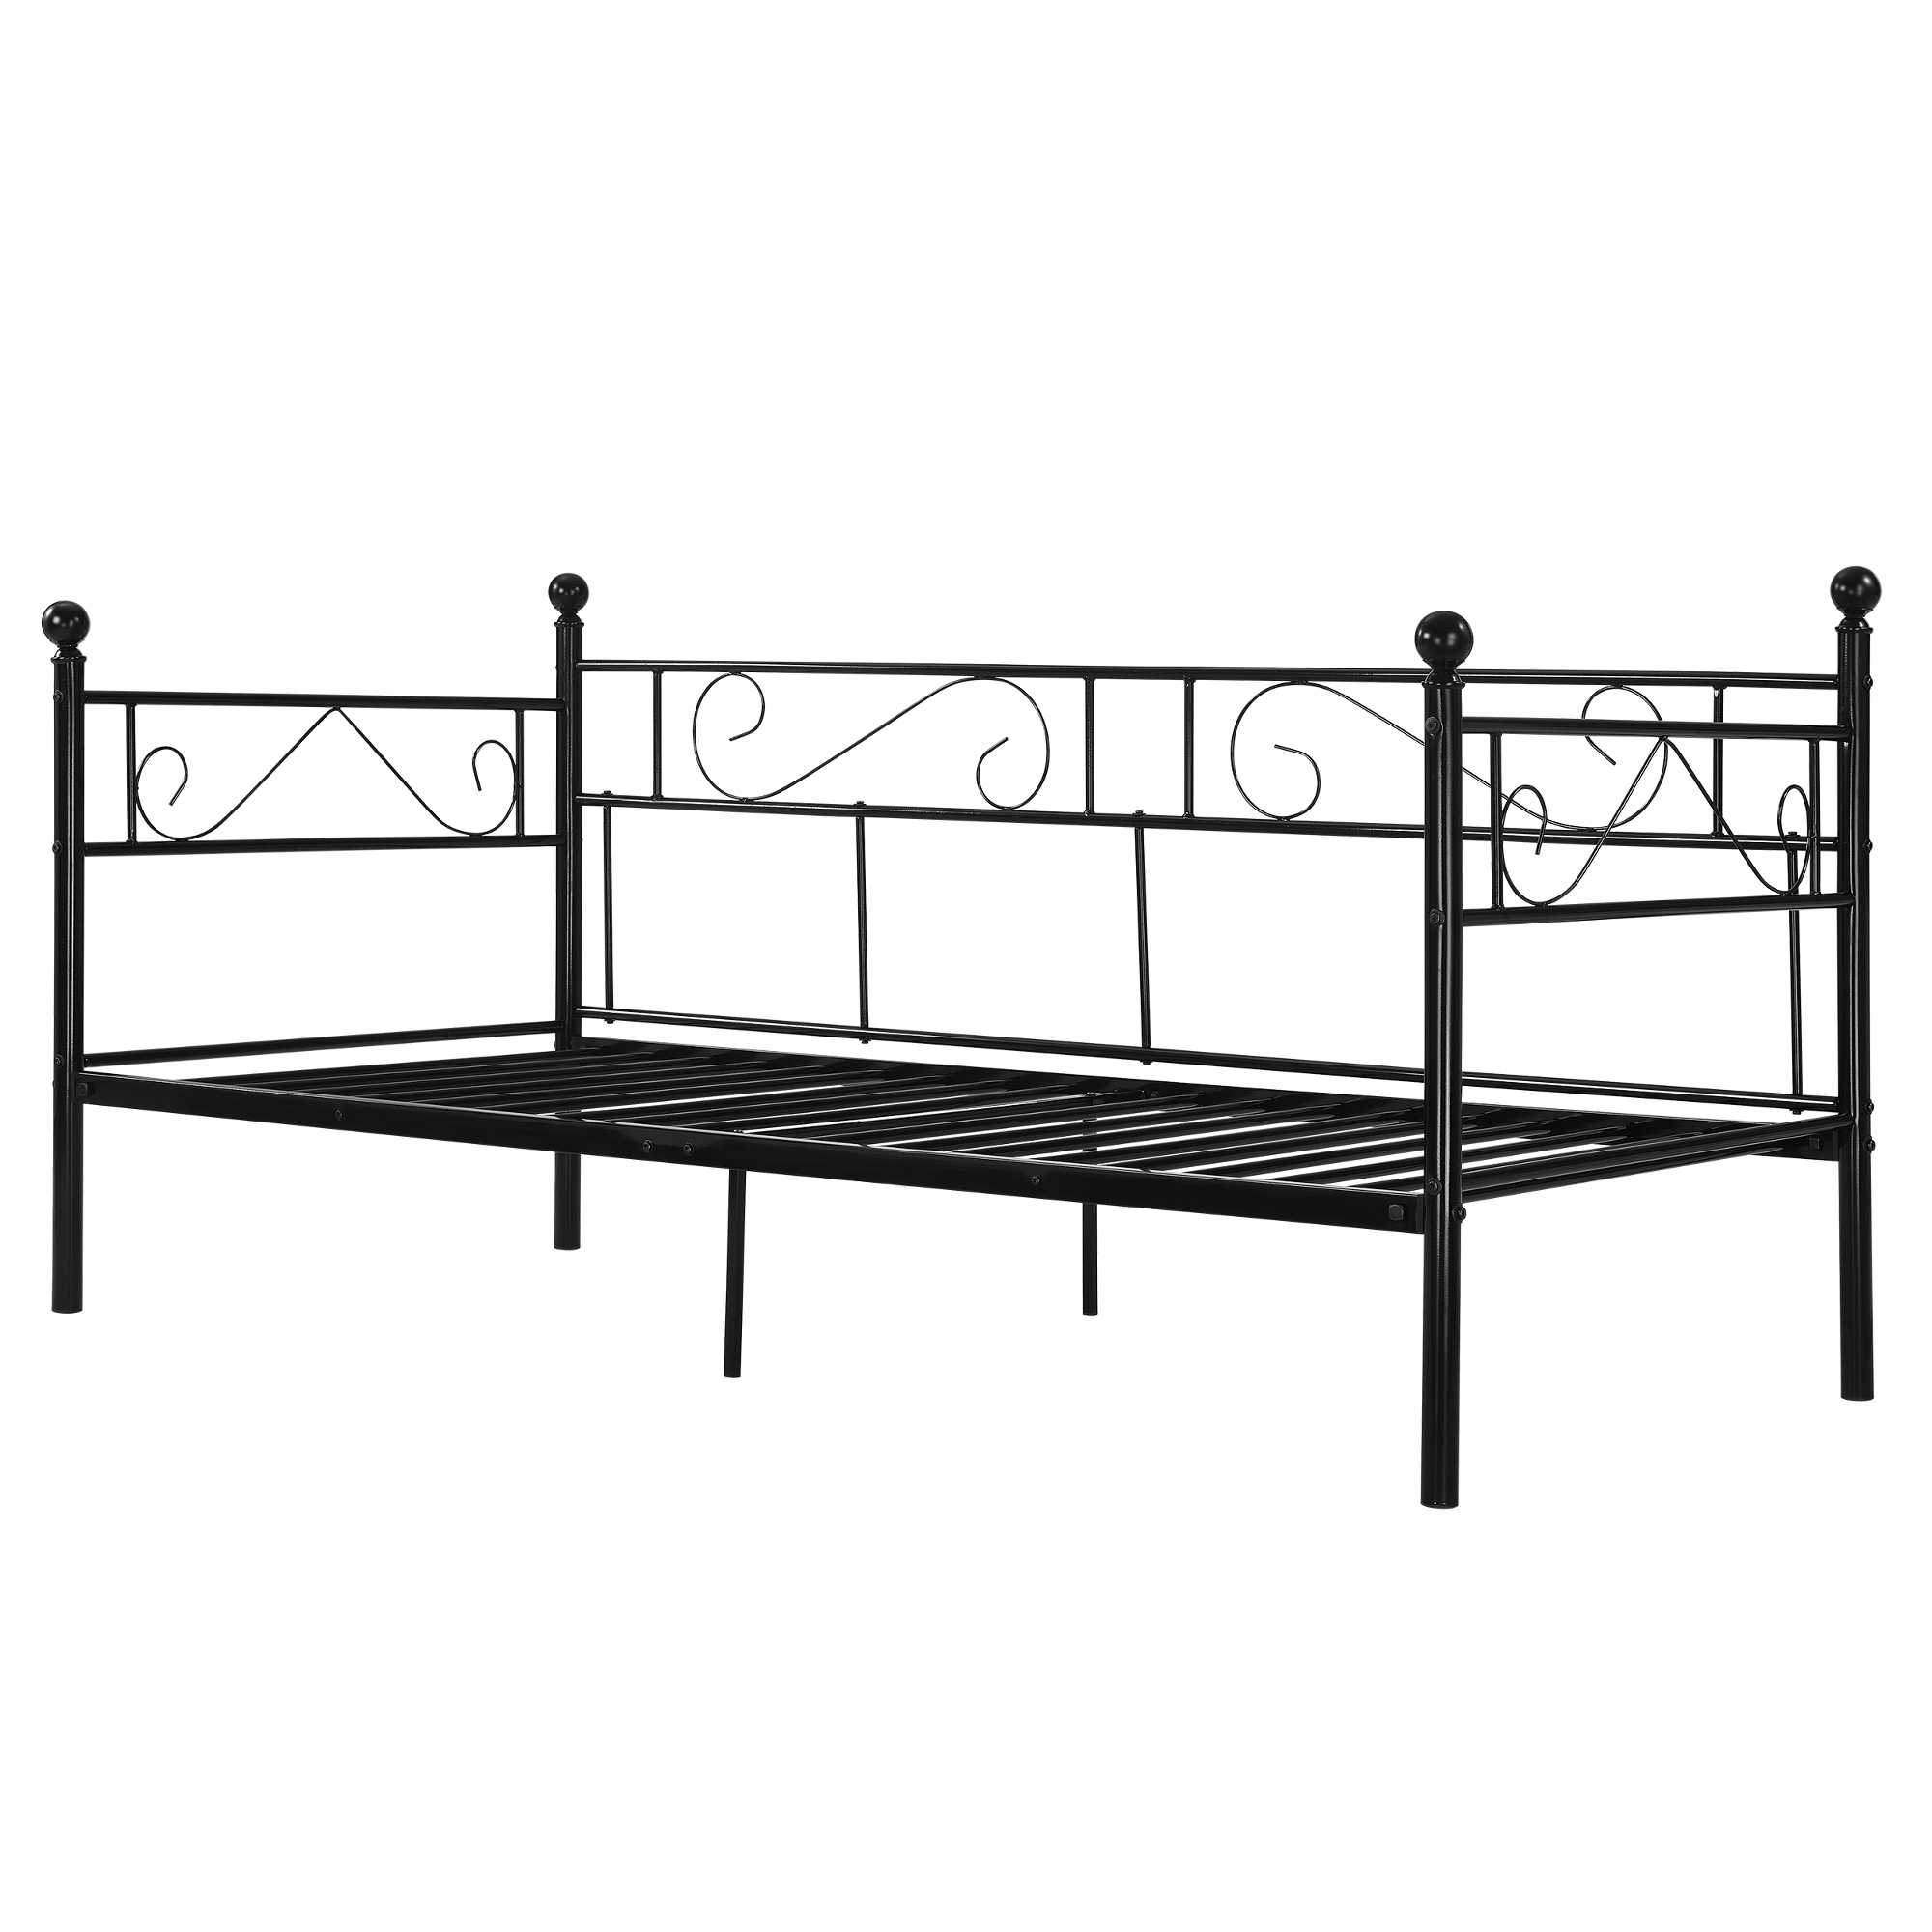 Full Size of Encasa Tagesbett 90x200 Metallbett Bett Daybed Bettsofa Kojenbett Betten 100x200 Weiß Wohnzimmer Metallbett 100x200